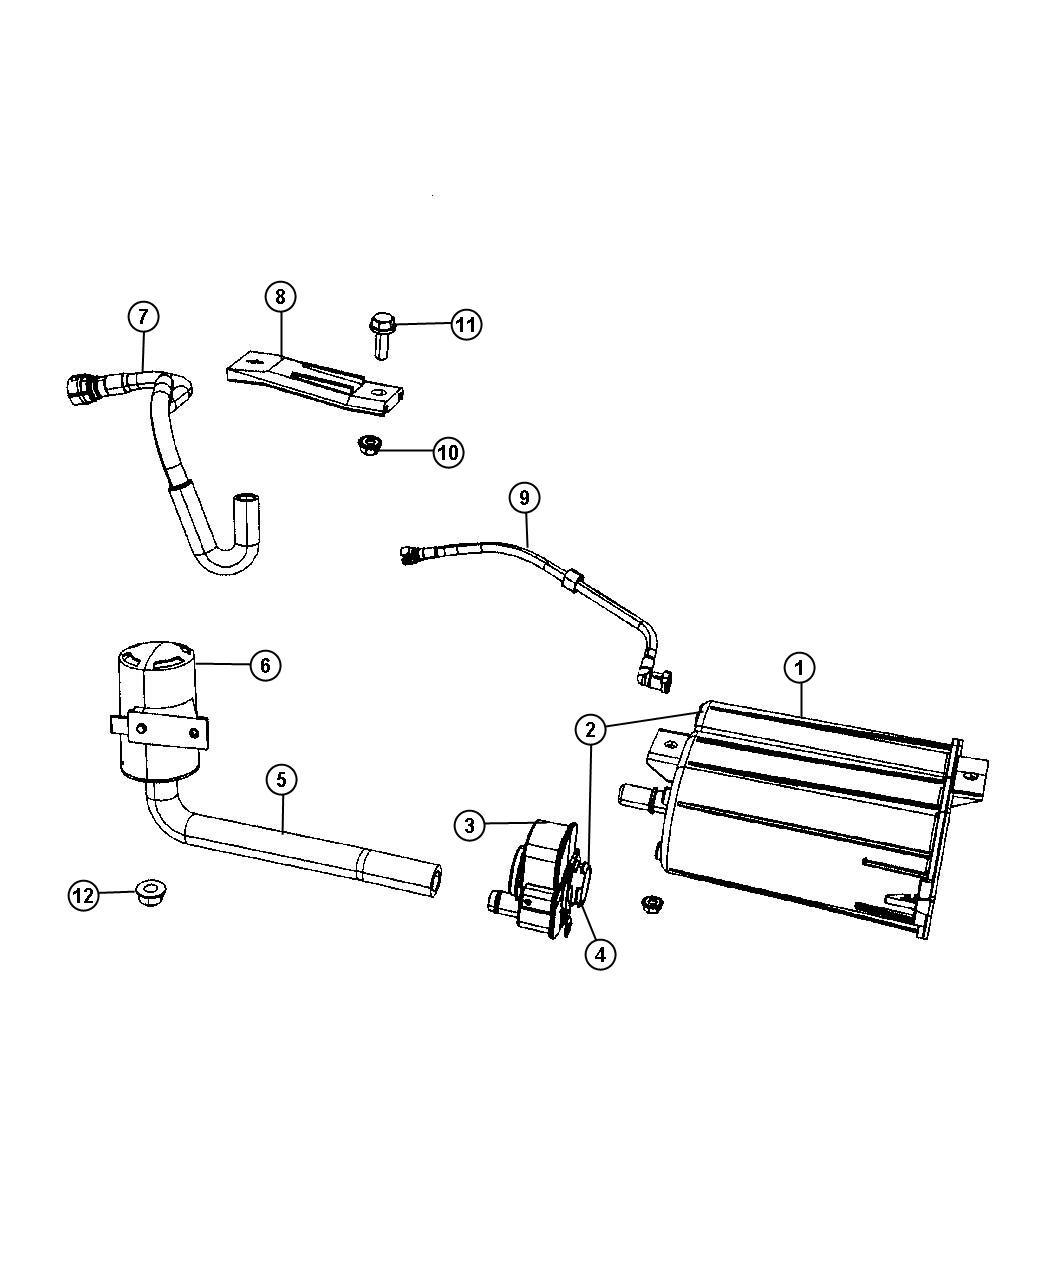 Dodge Caliber Vapor Canister And Leak Detection Pump